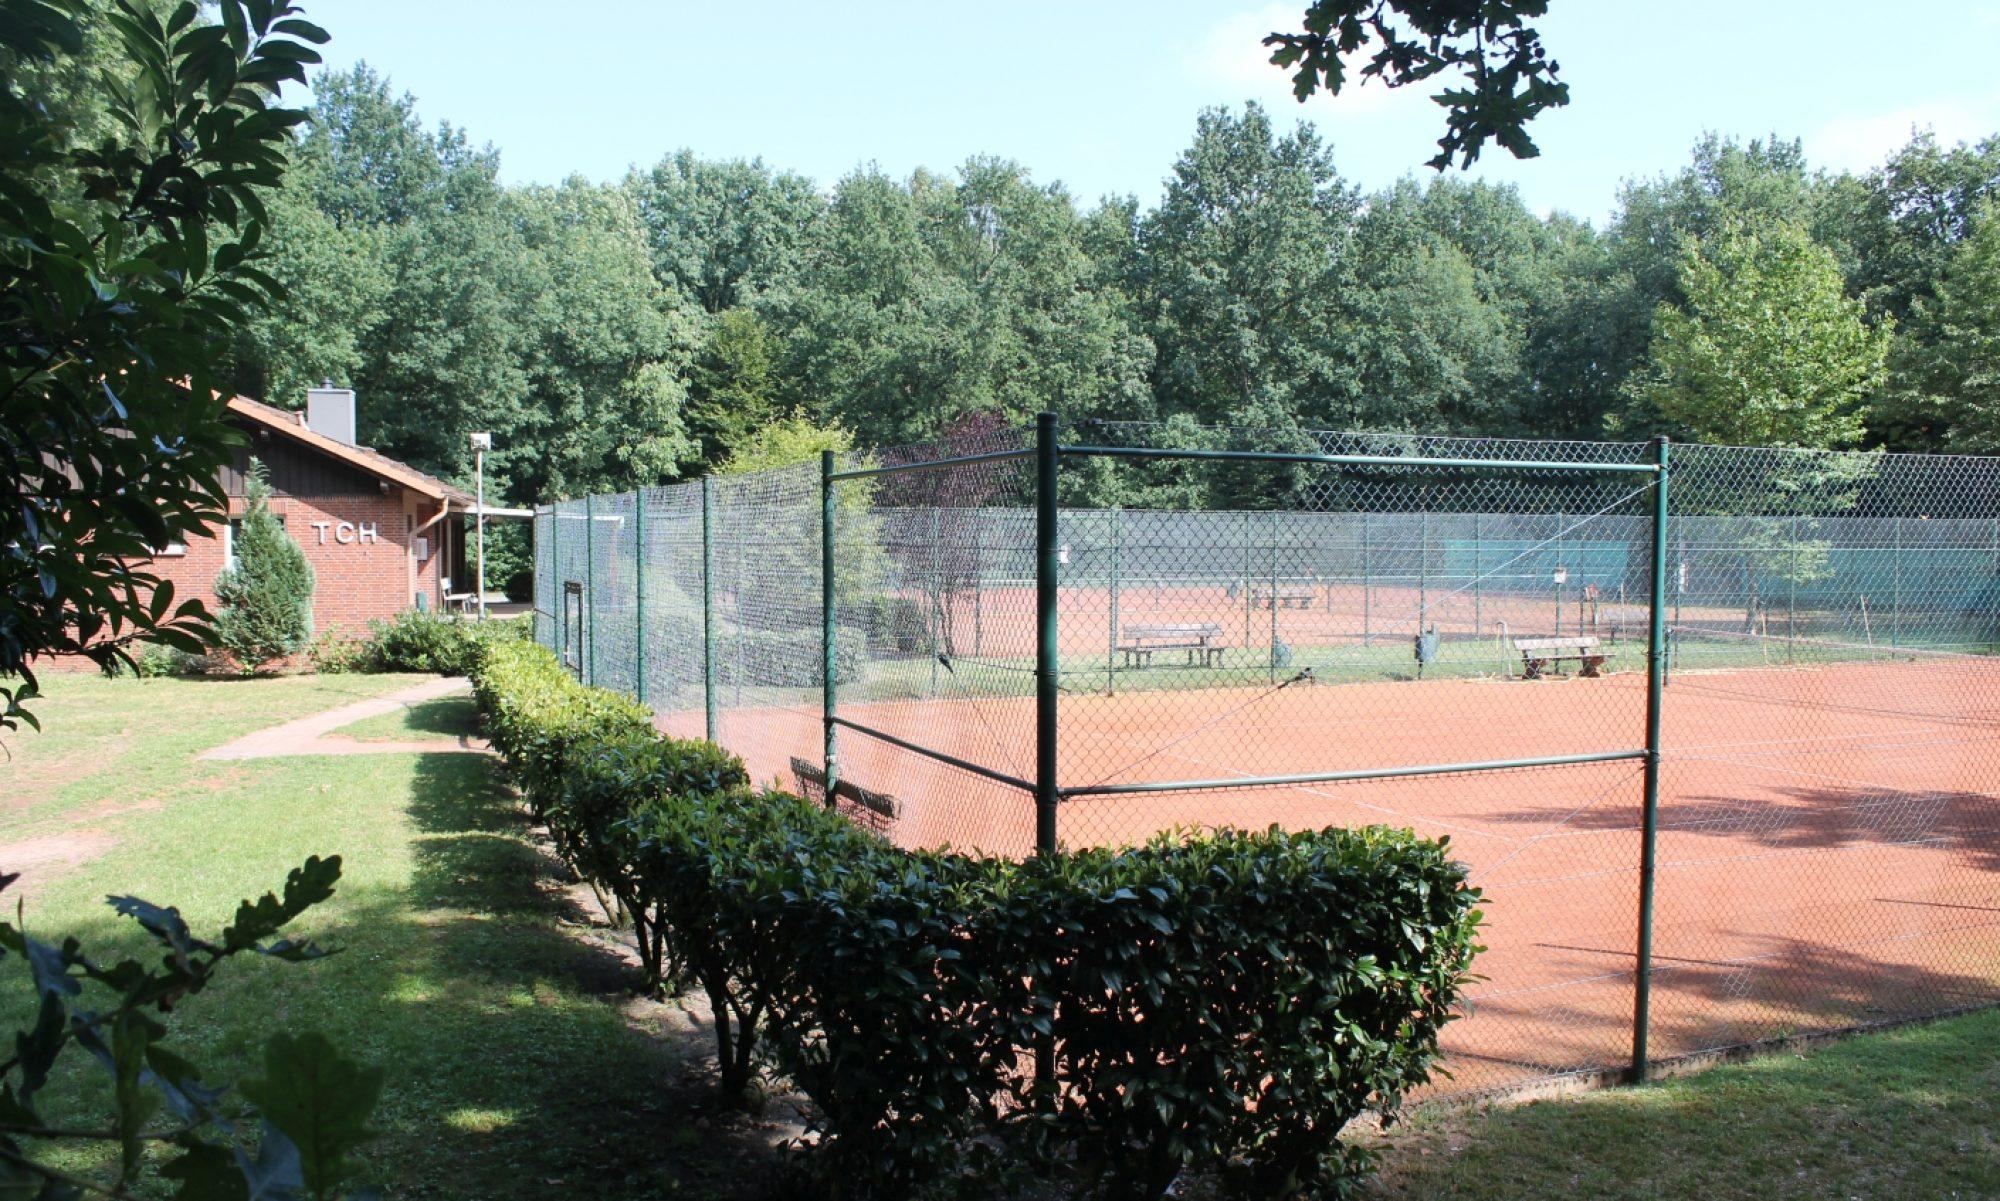 Tennis-Club Haddorf von 1984 e.V.